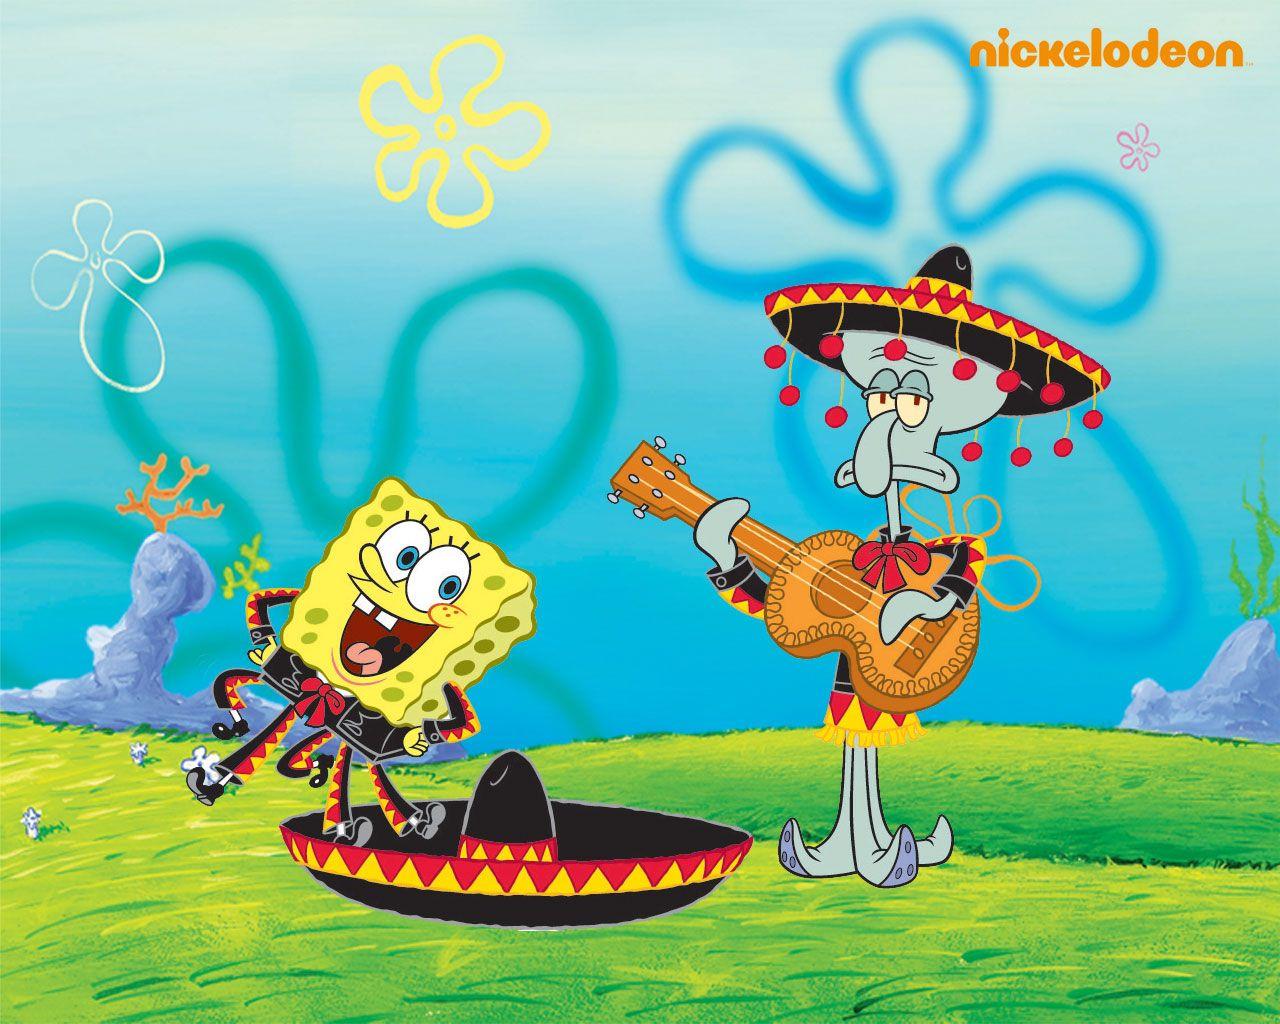 Spongebob Squarepants Wallpaper: Spongebob & Squidward